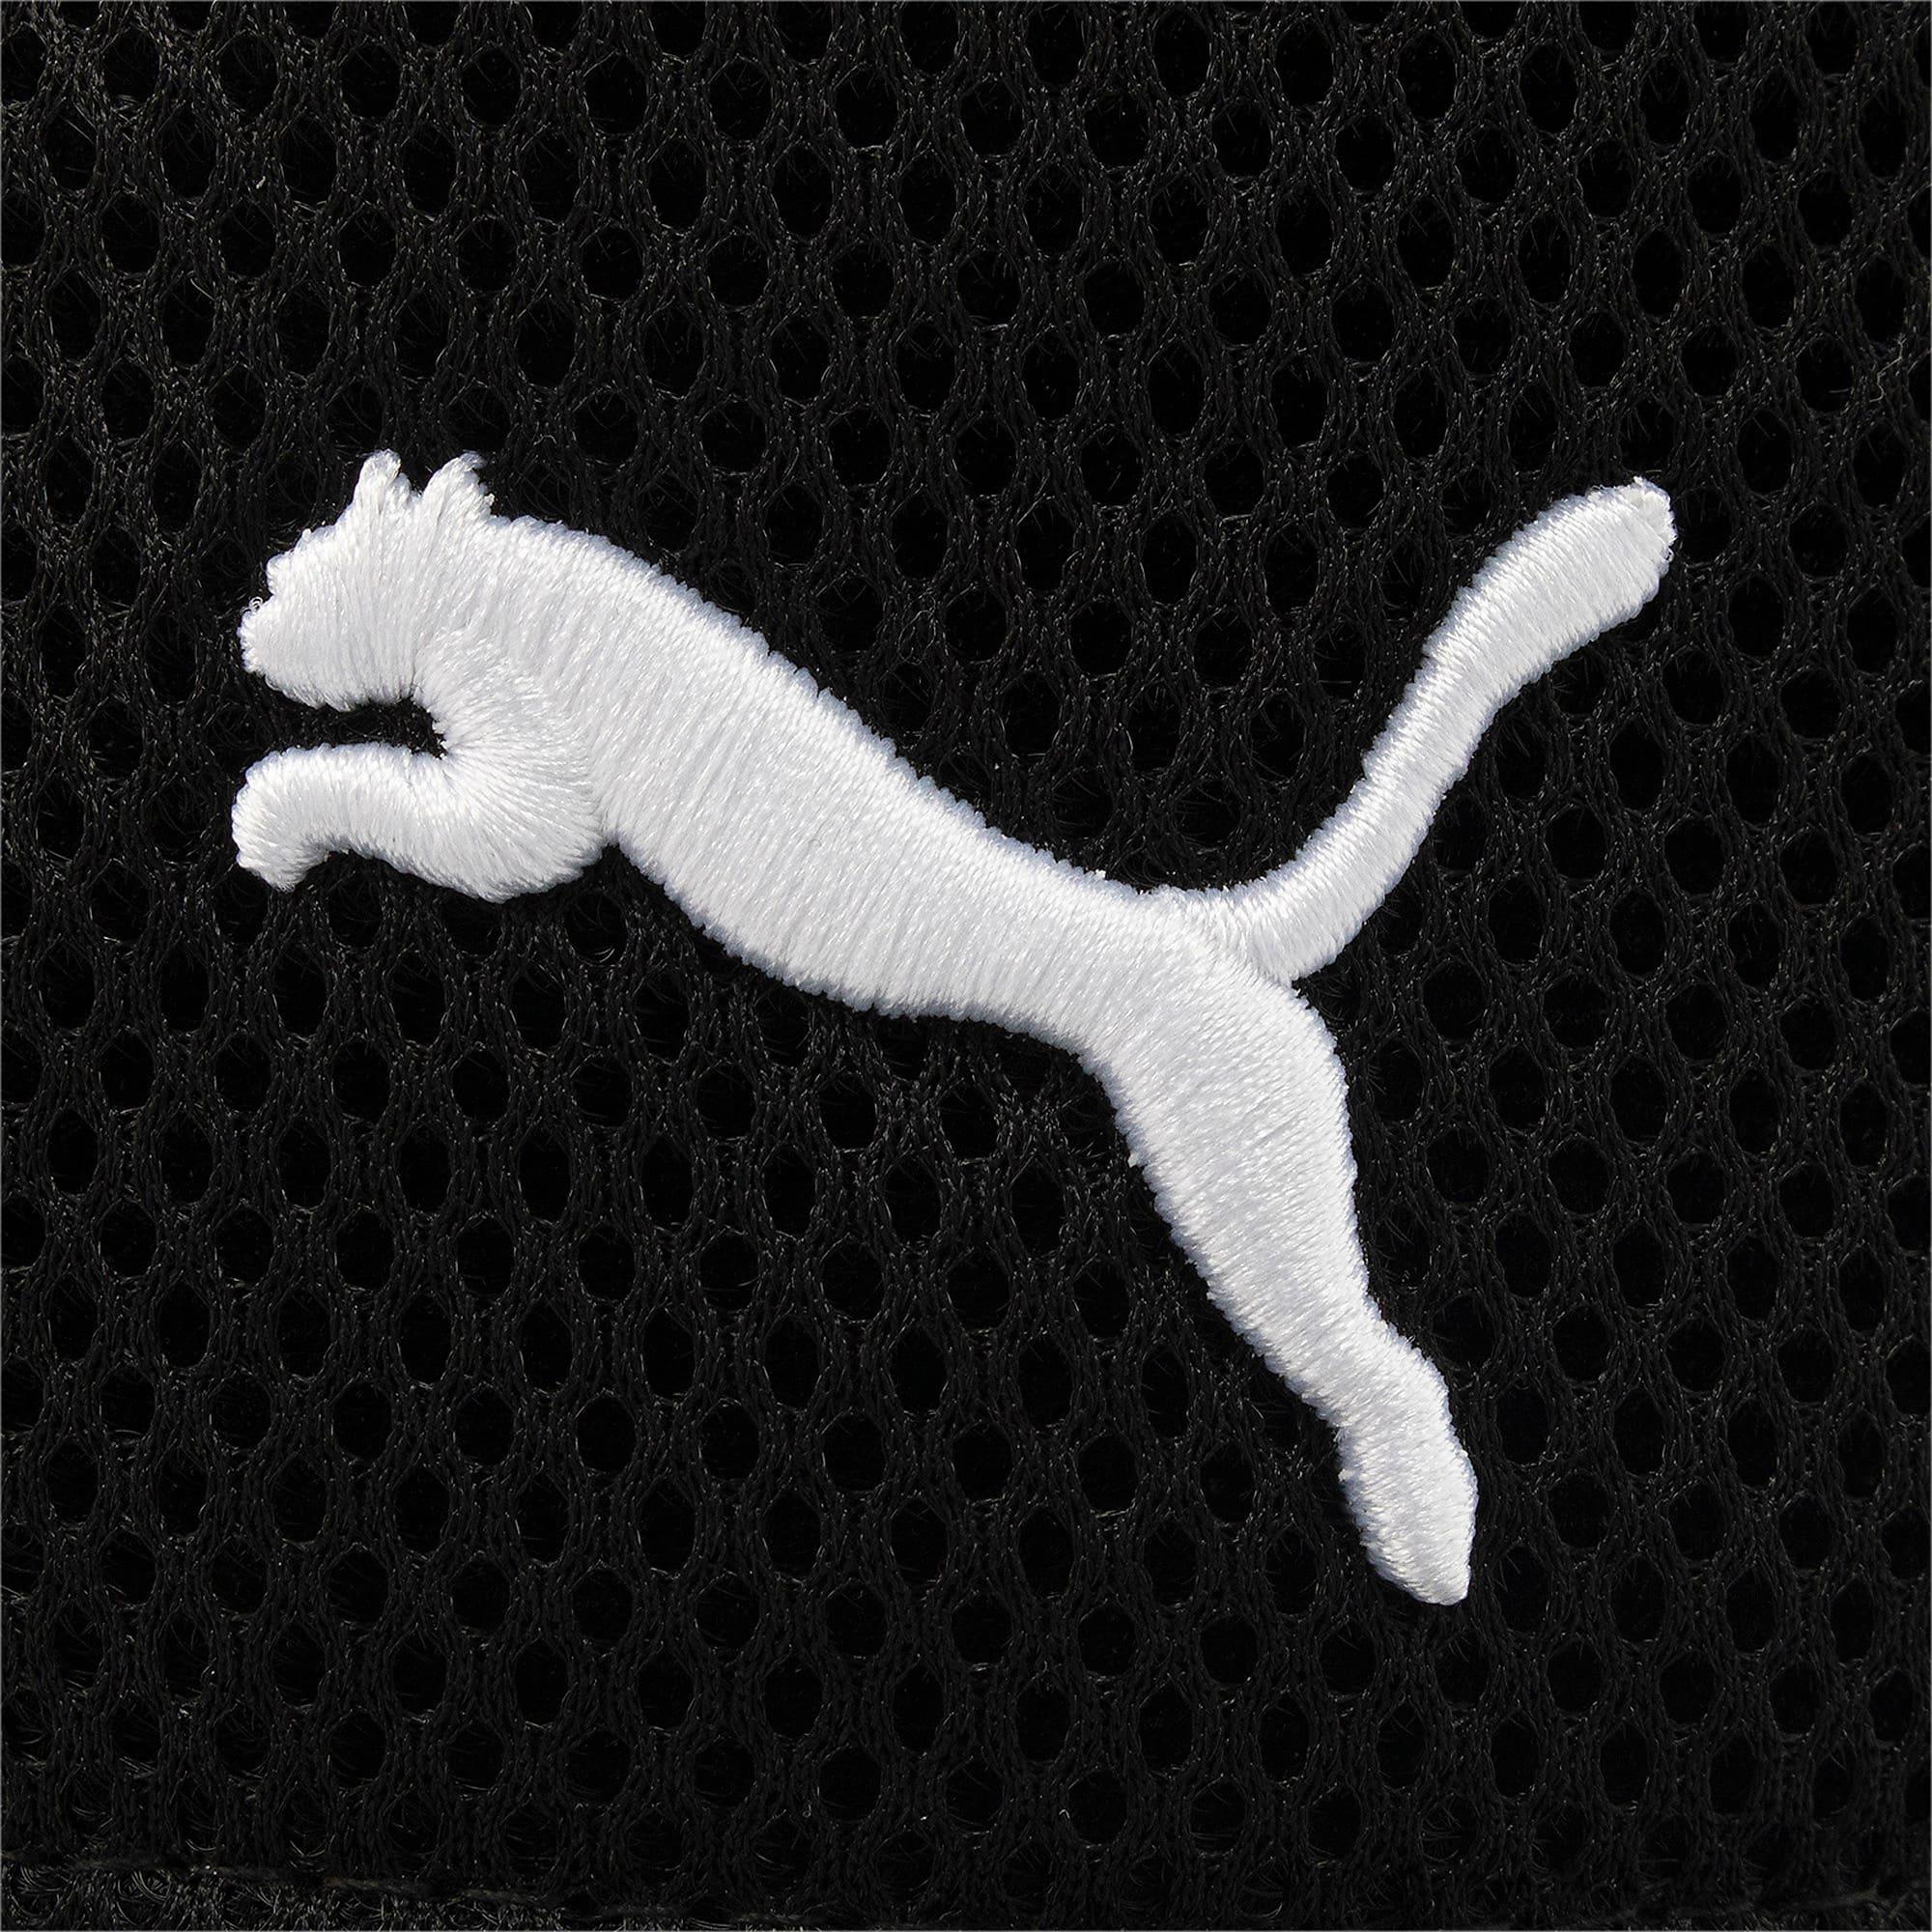 Thumbnail 6 of キッズ トレーニング メッシュ キャップ JR, Puma Black, medium-JPN